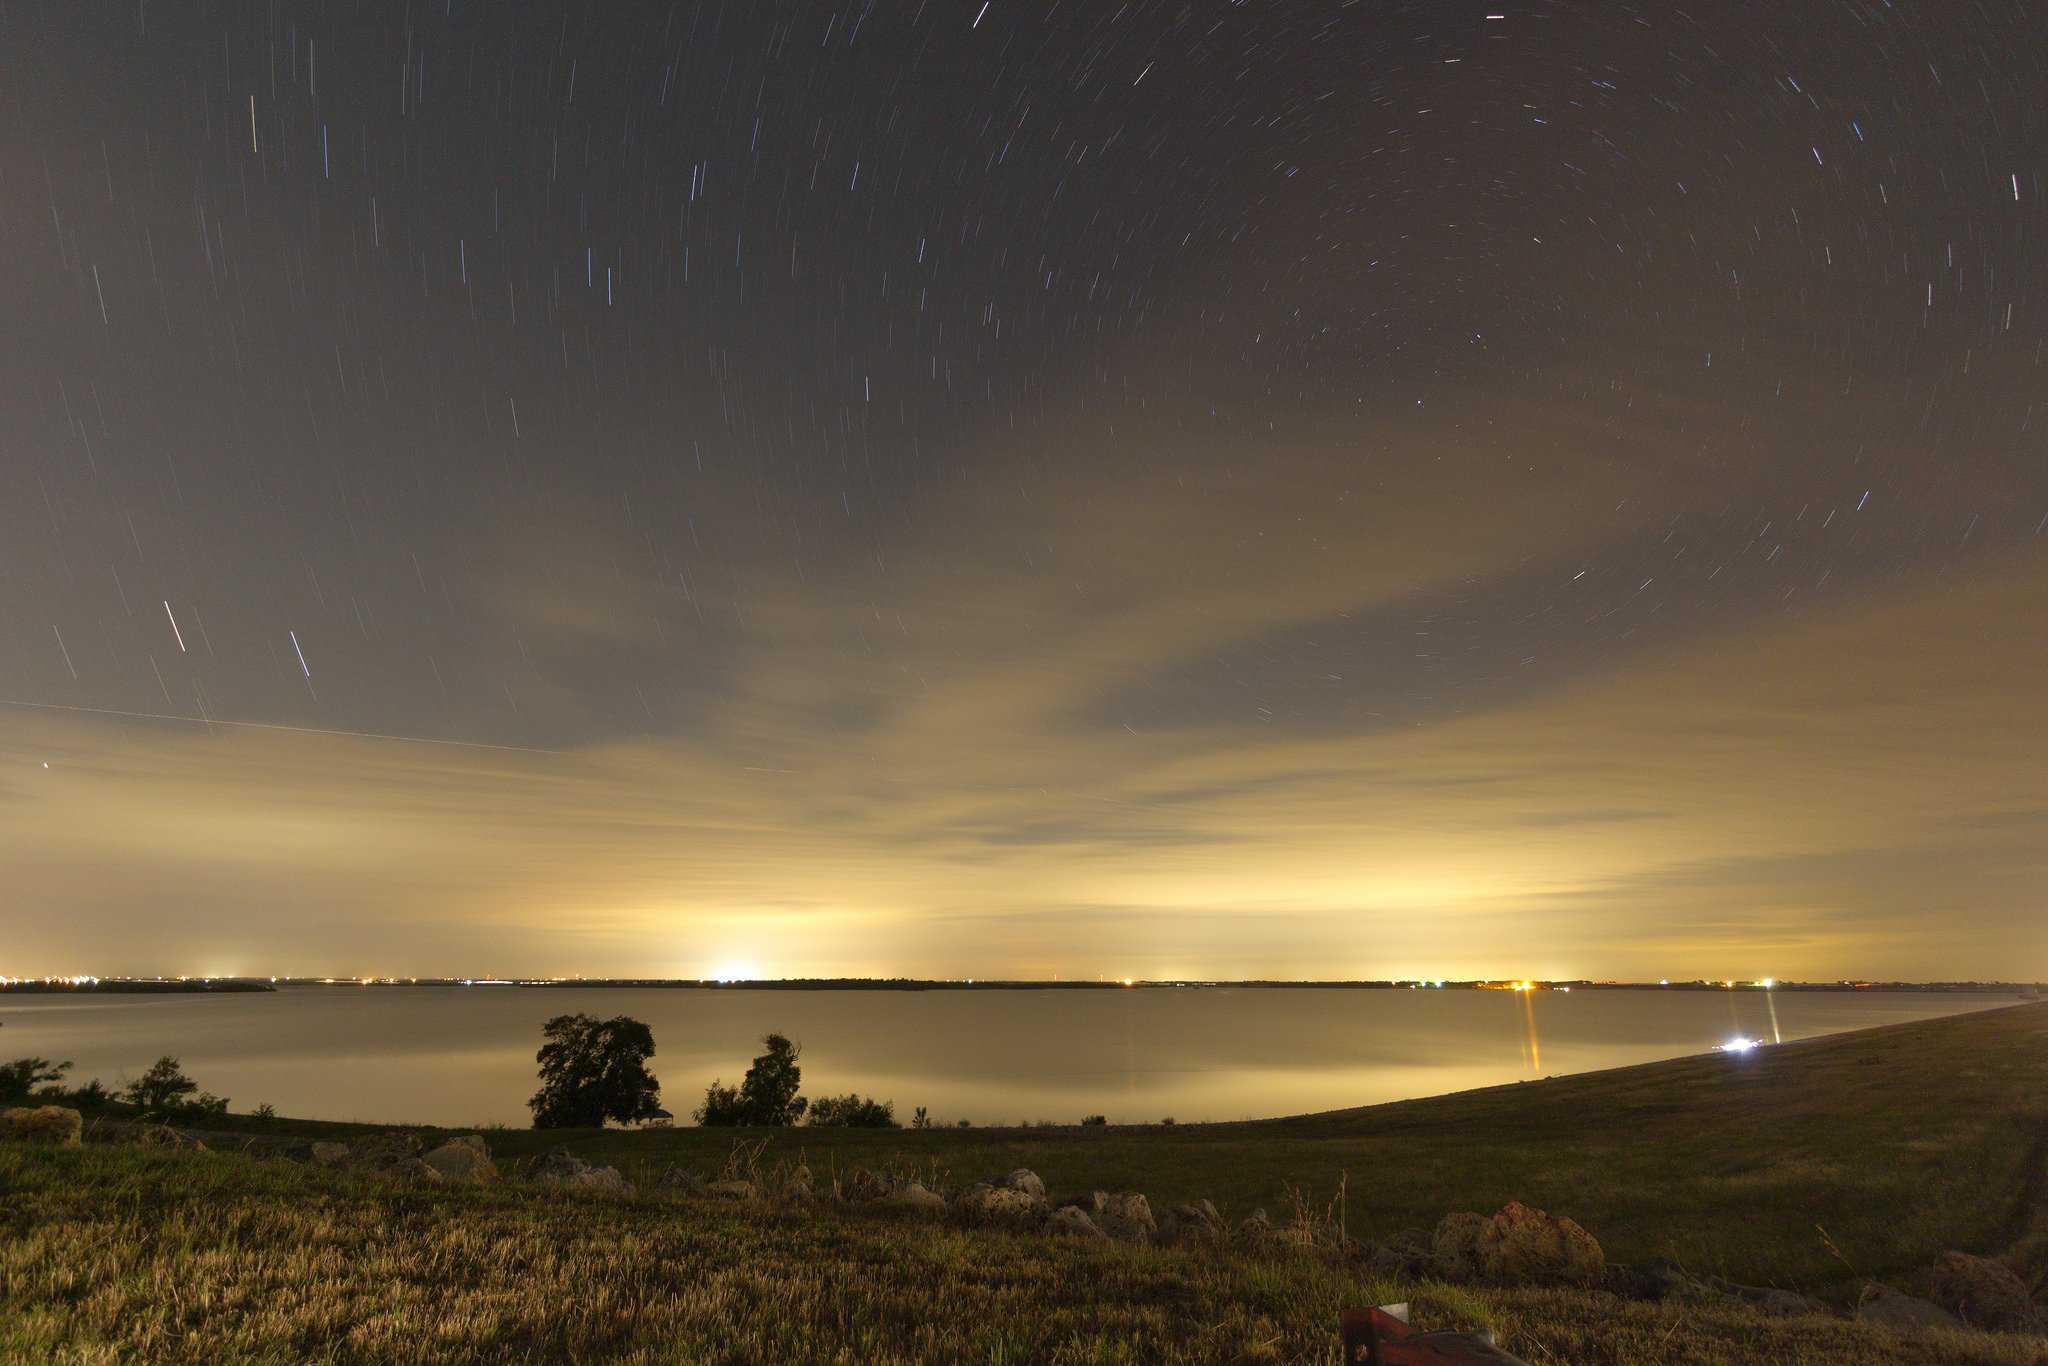 Stargazing near Dallas - Steve via Flickr